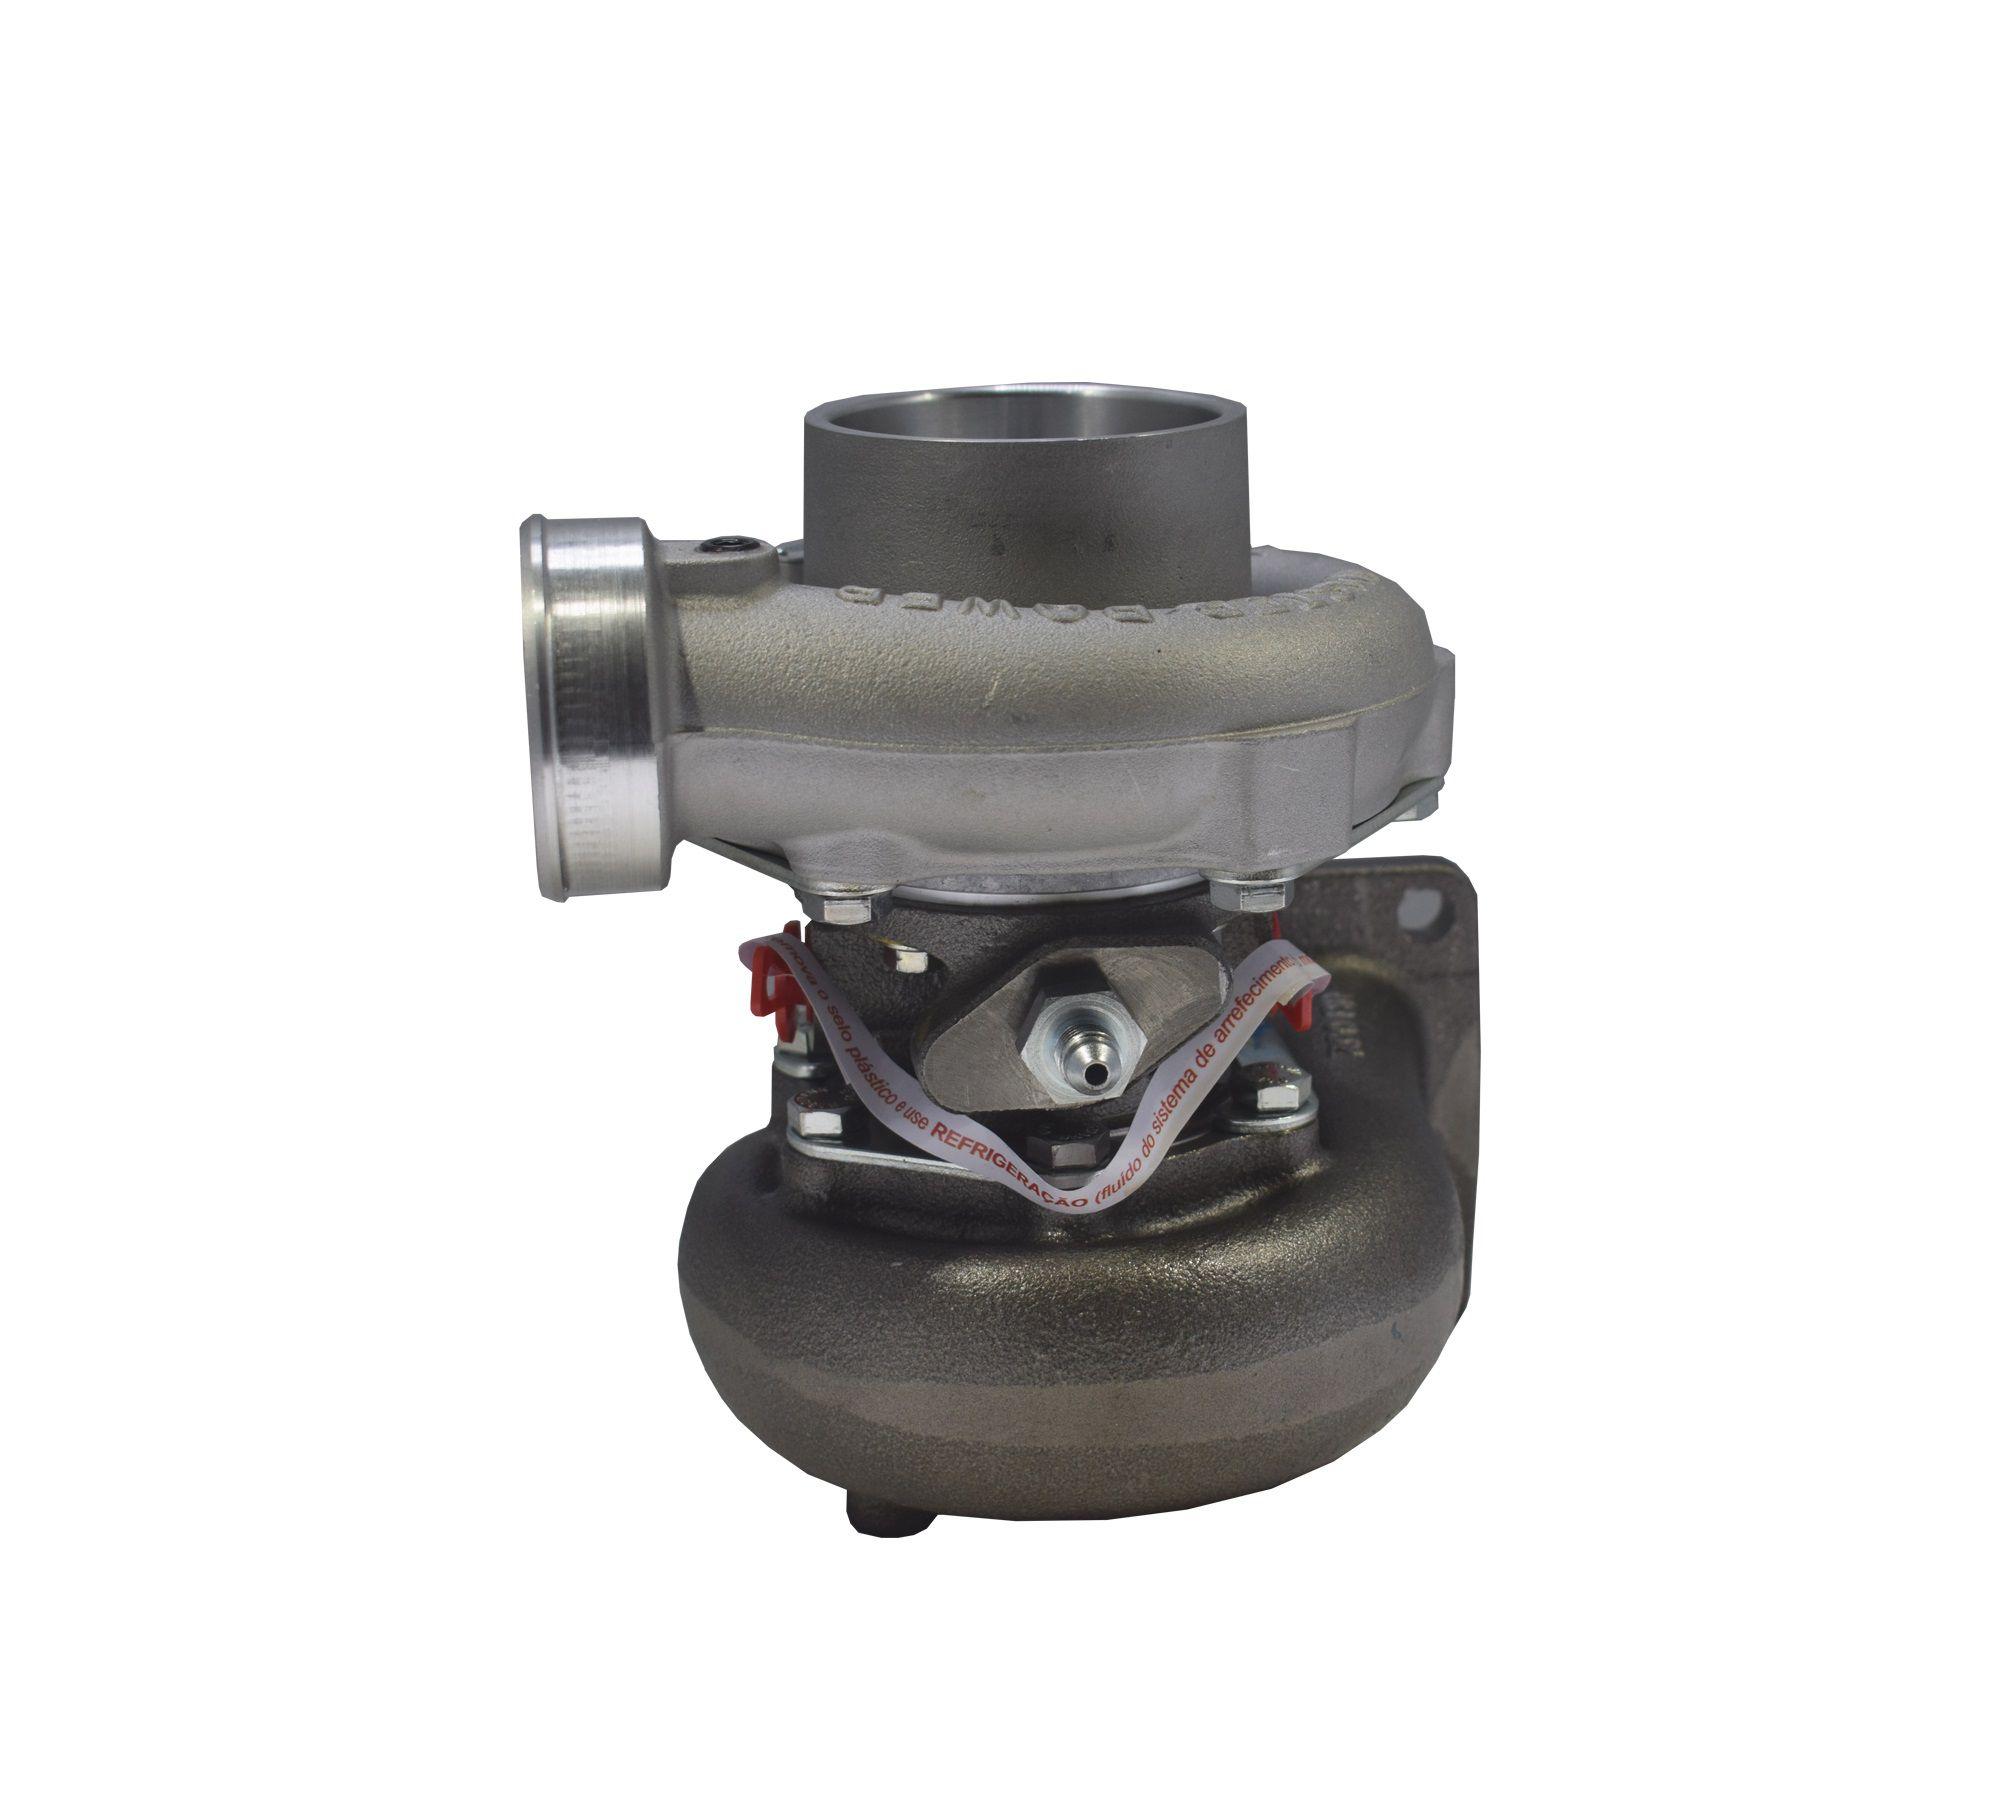 Turbina Roletada / BallBearing Master Power - RB 494 48. Mono